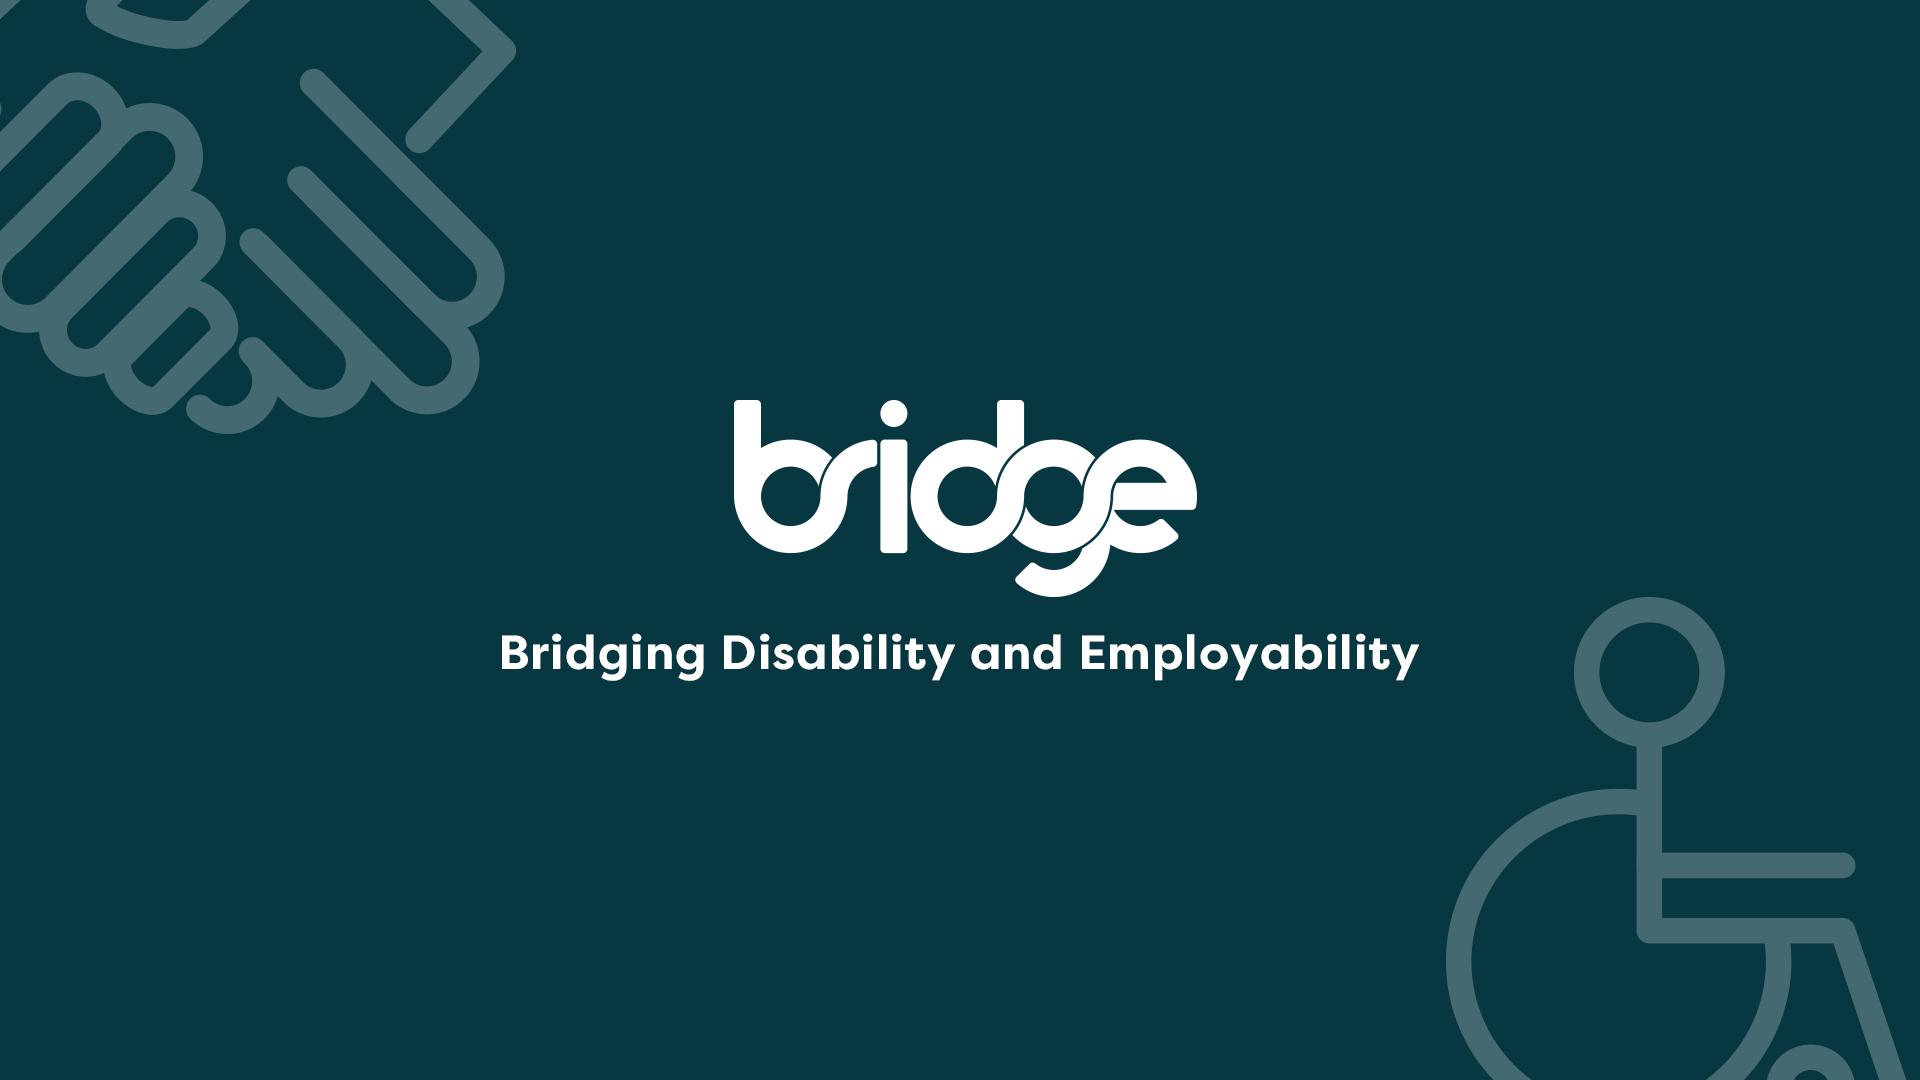 Bridge: Disability and Employment